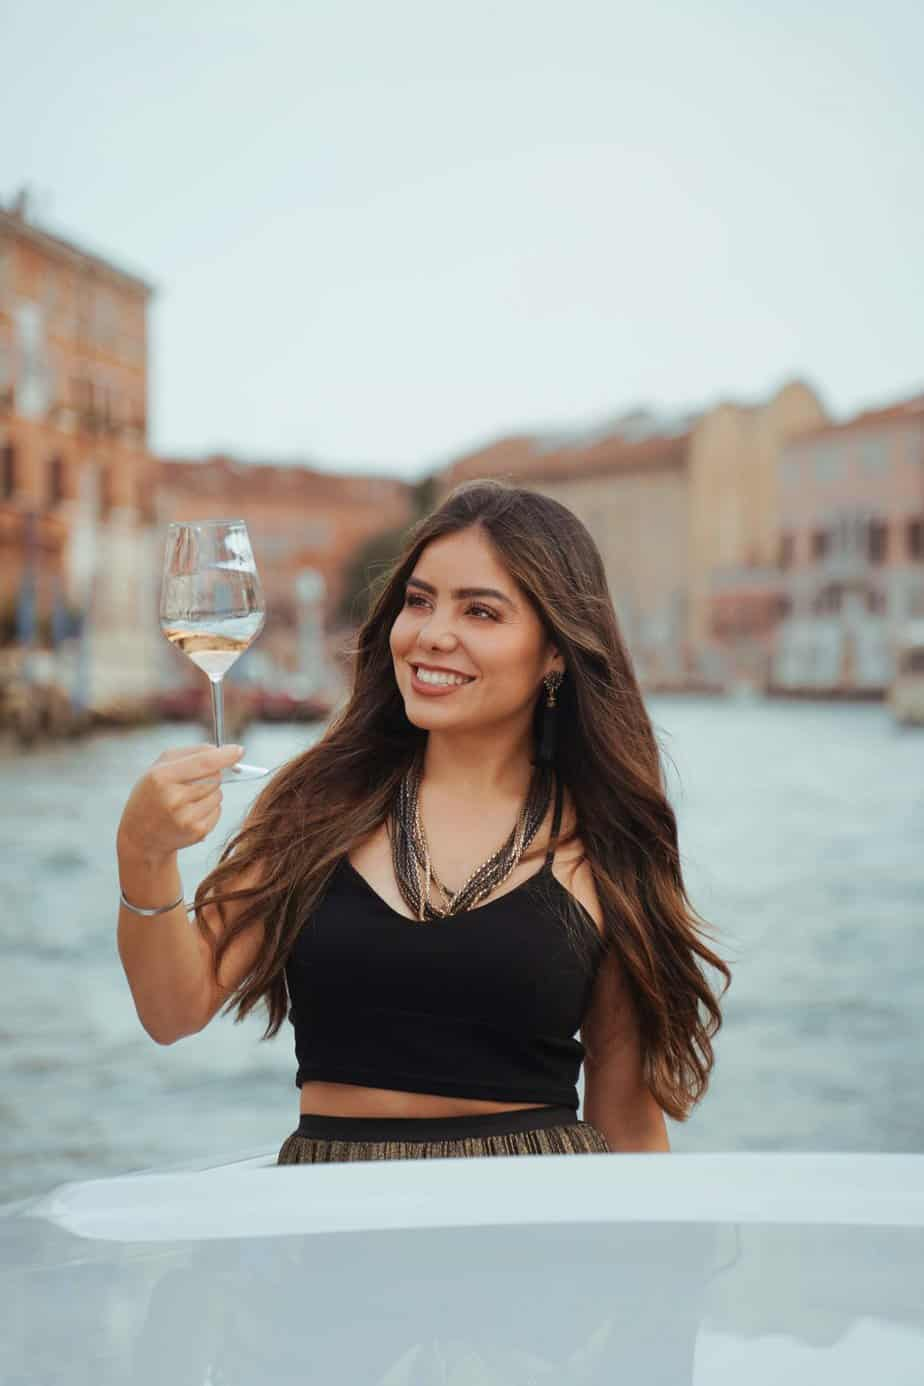 Anais_Pasquawines_Venezia1